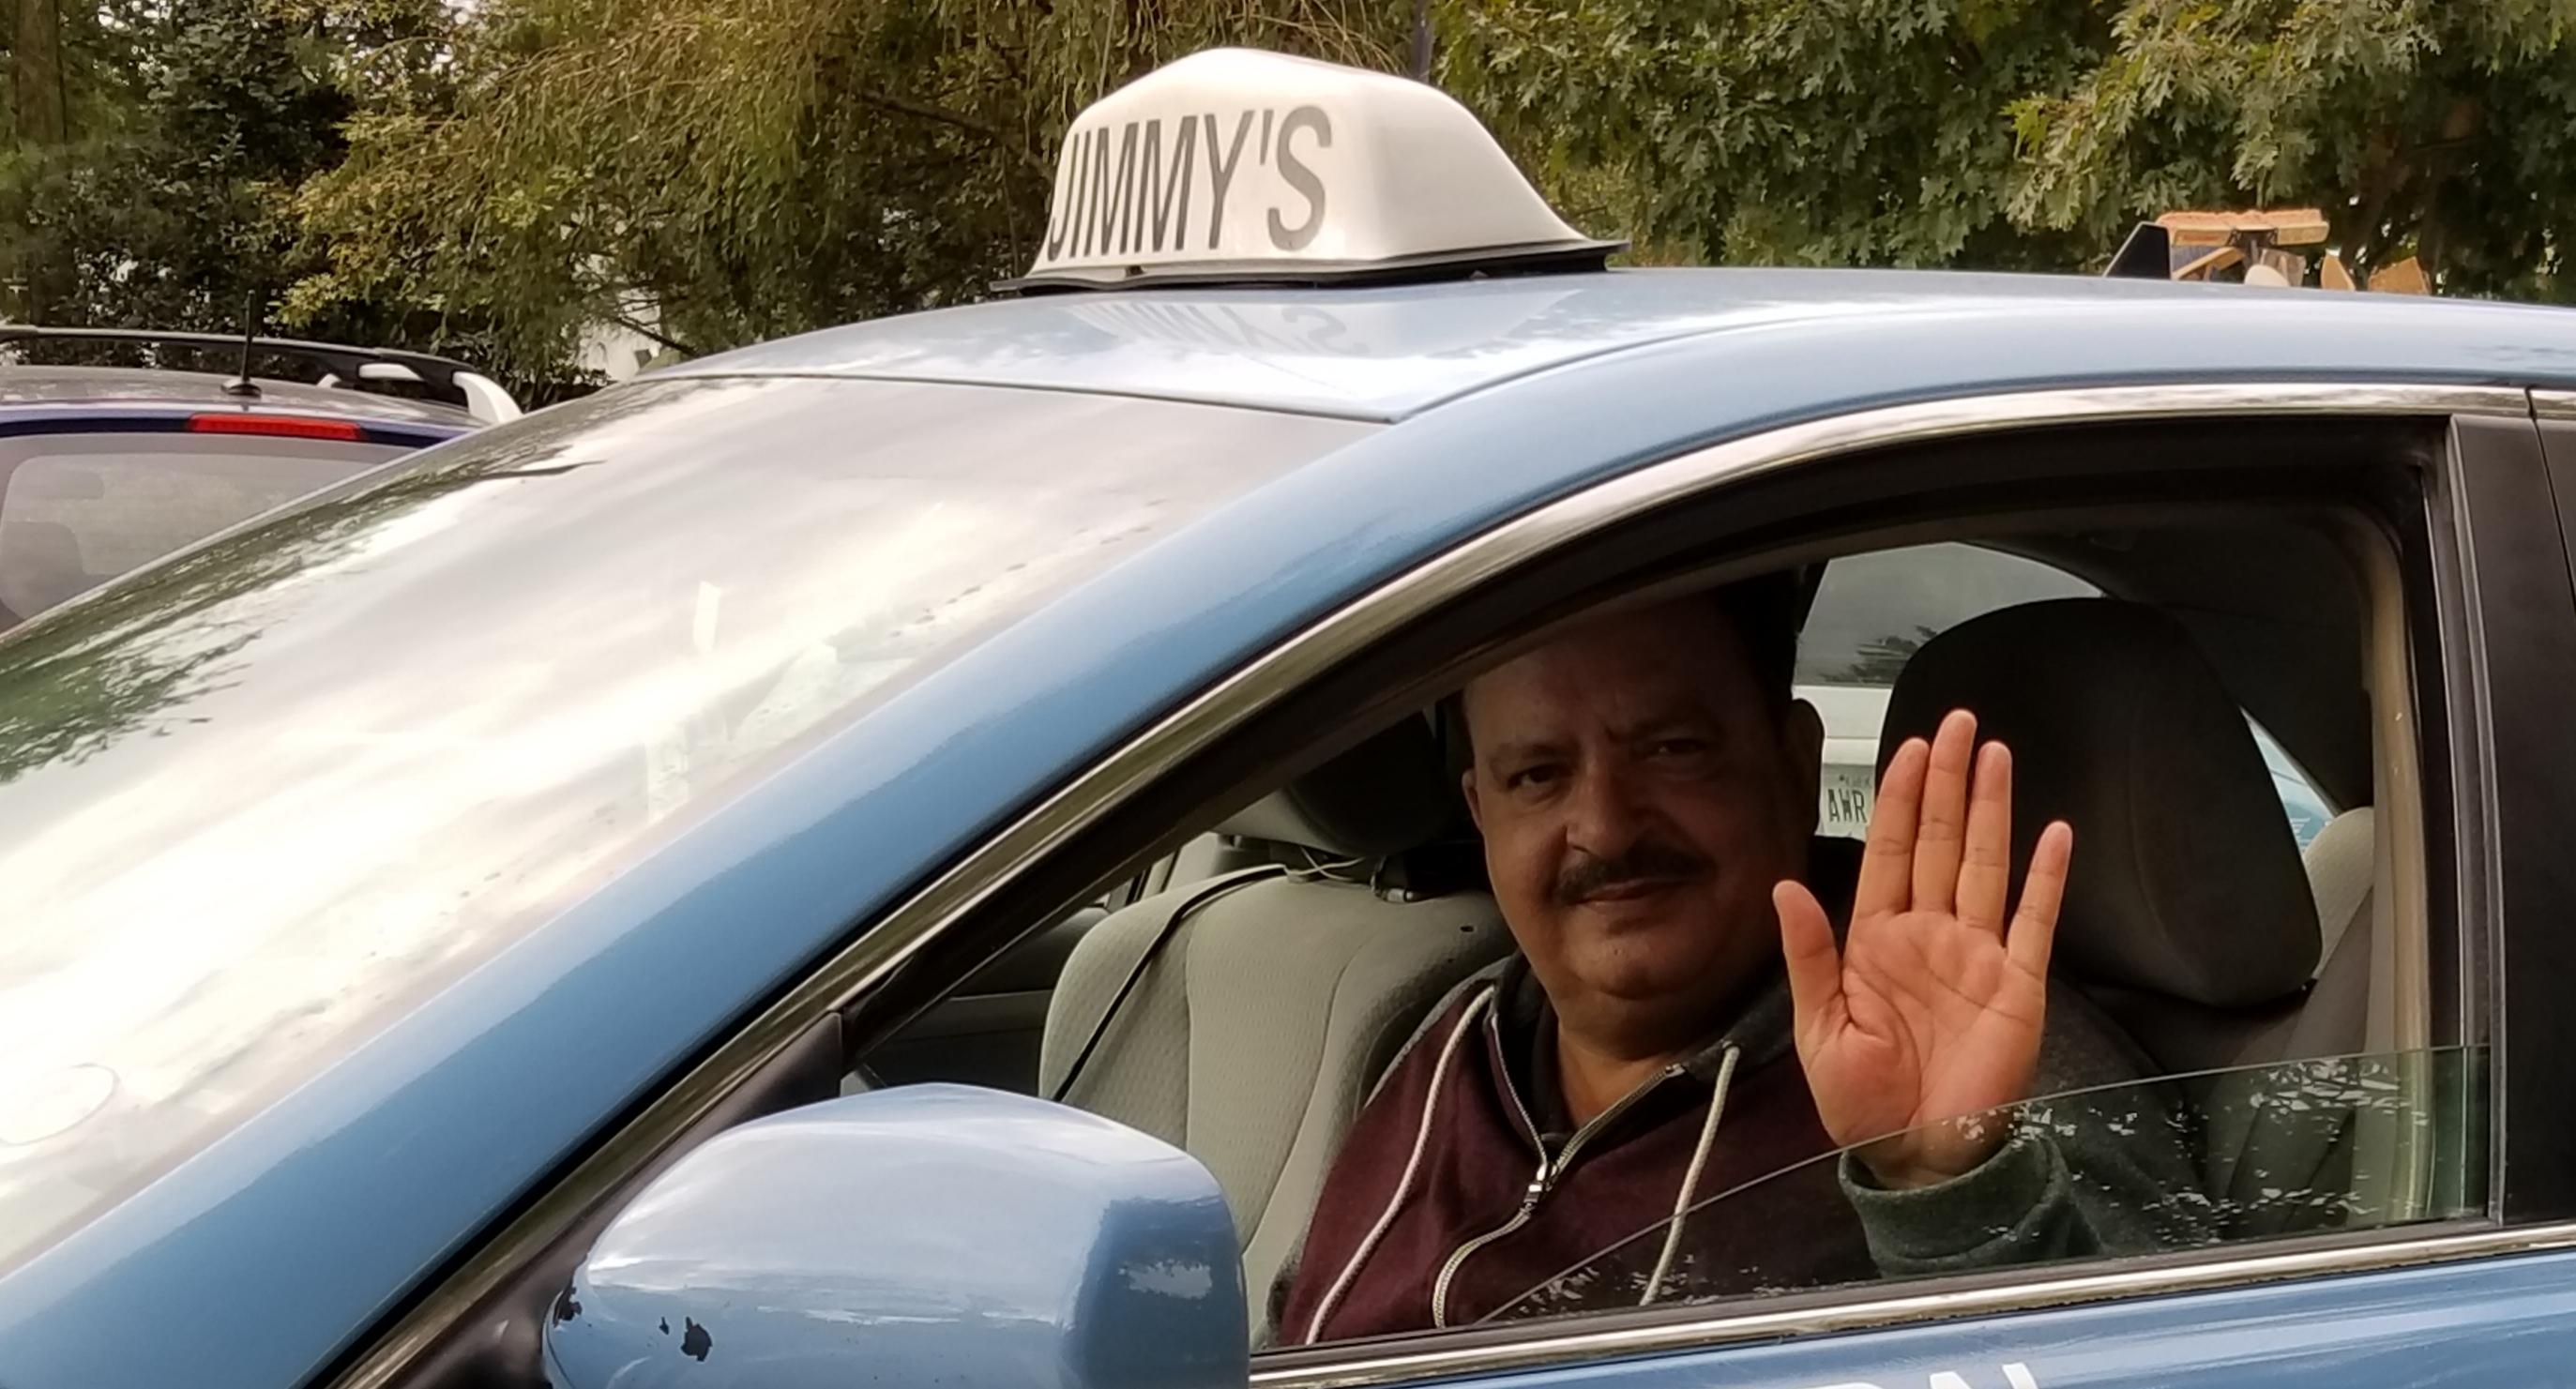 Jimmy's Cab Co image 5